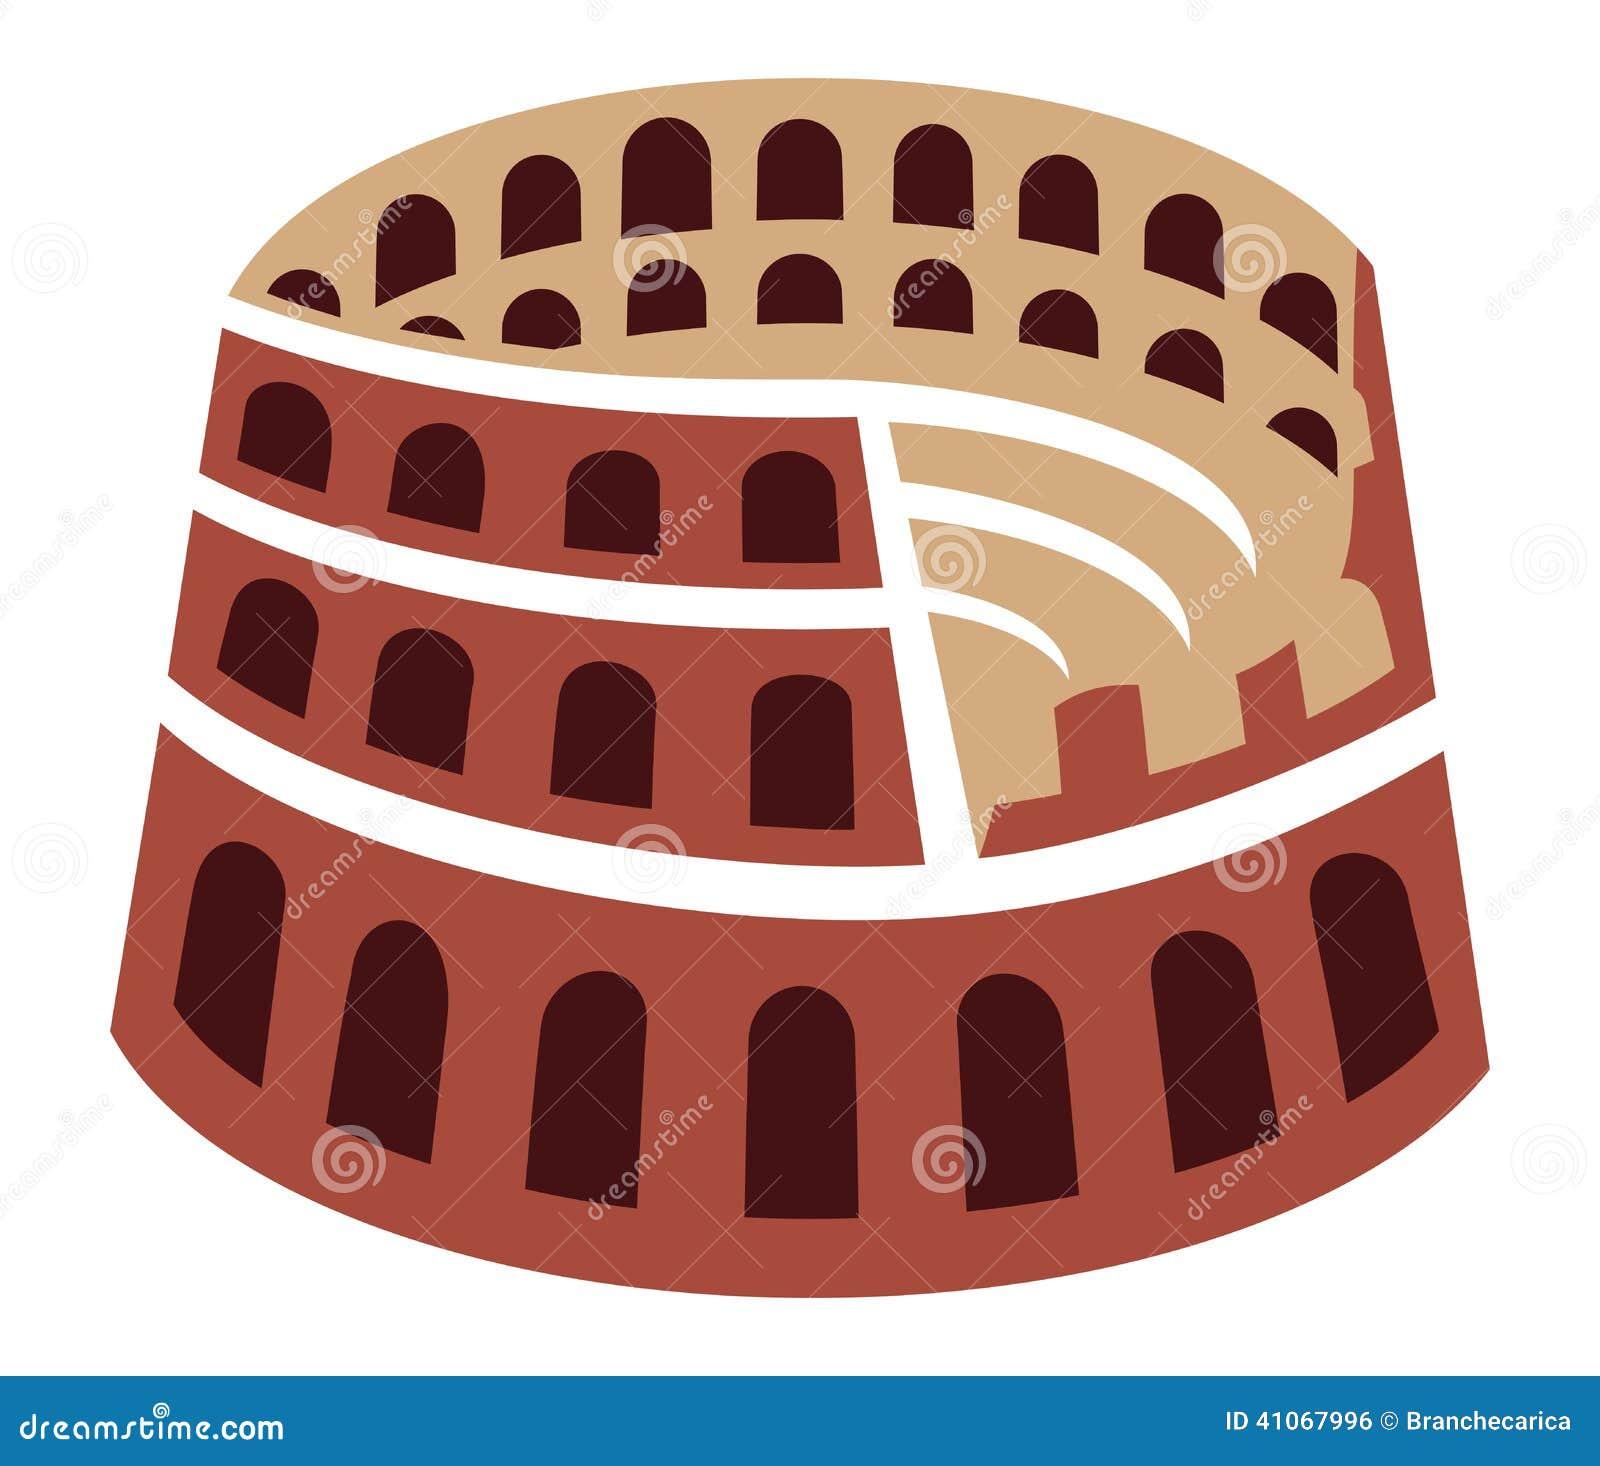 Rome : TV Series Folder Icon v1 by DYIDDO on DeviantArt